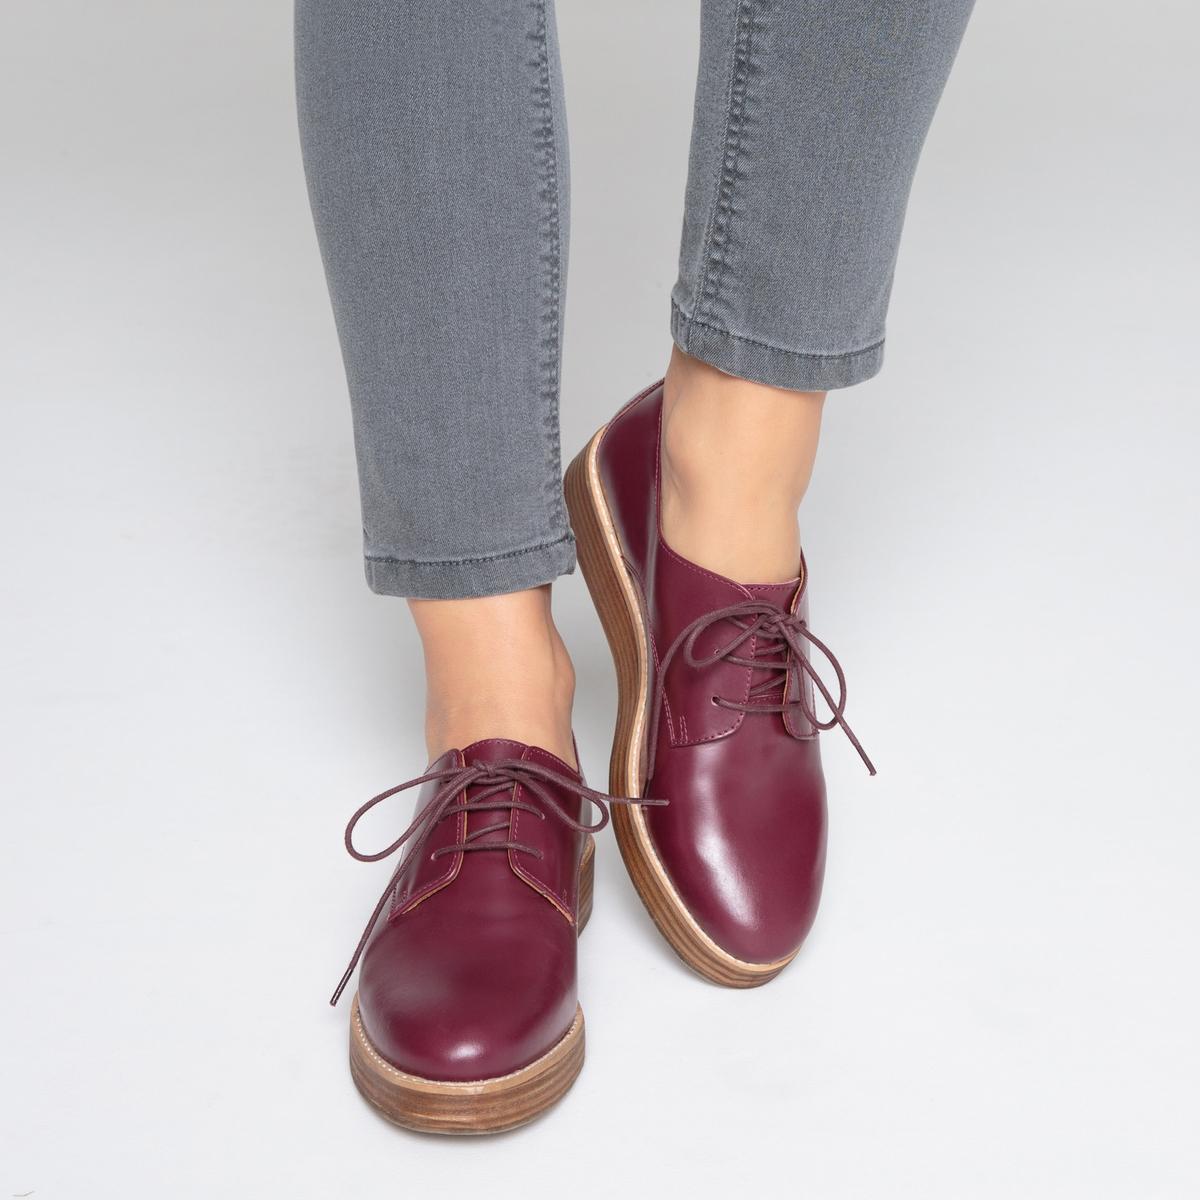 Ботинки-дерби на танкетке ботинки дерби под кожу питона